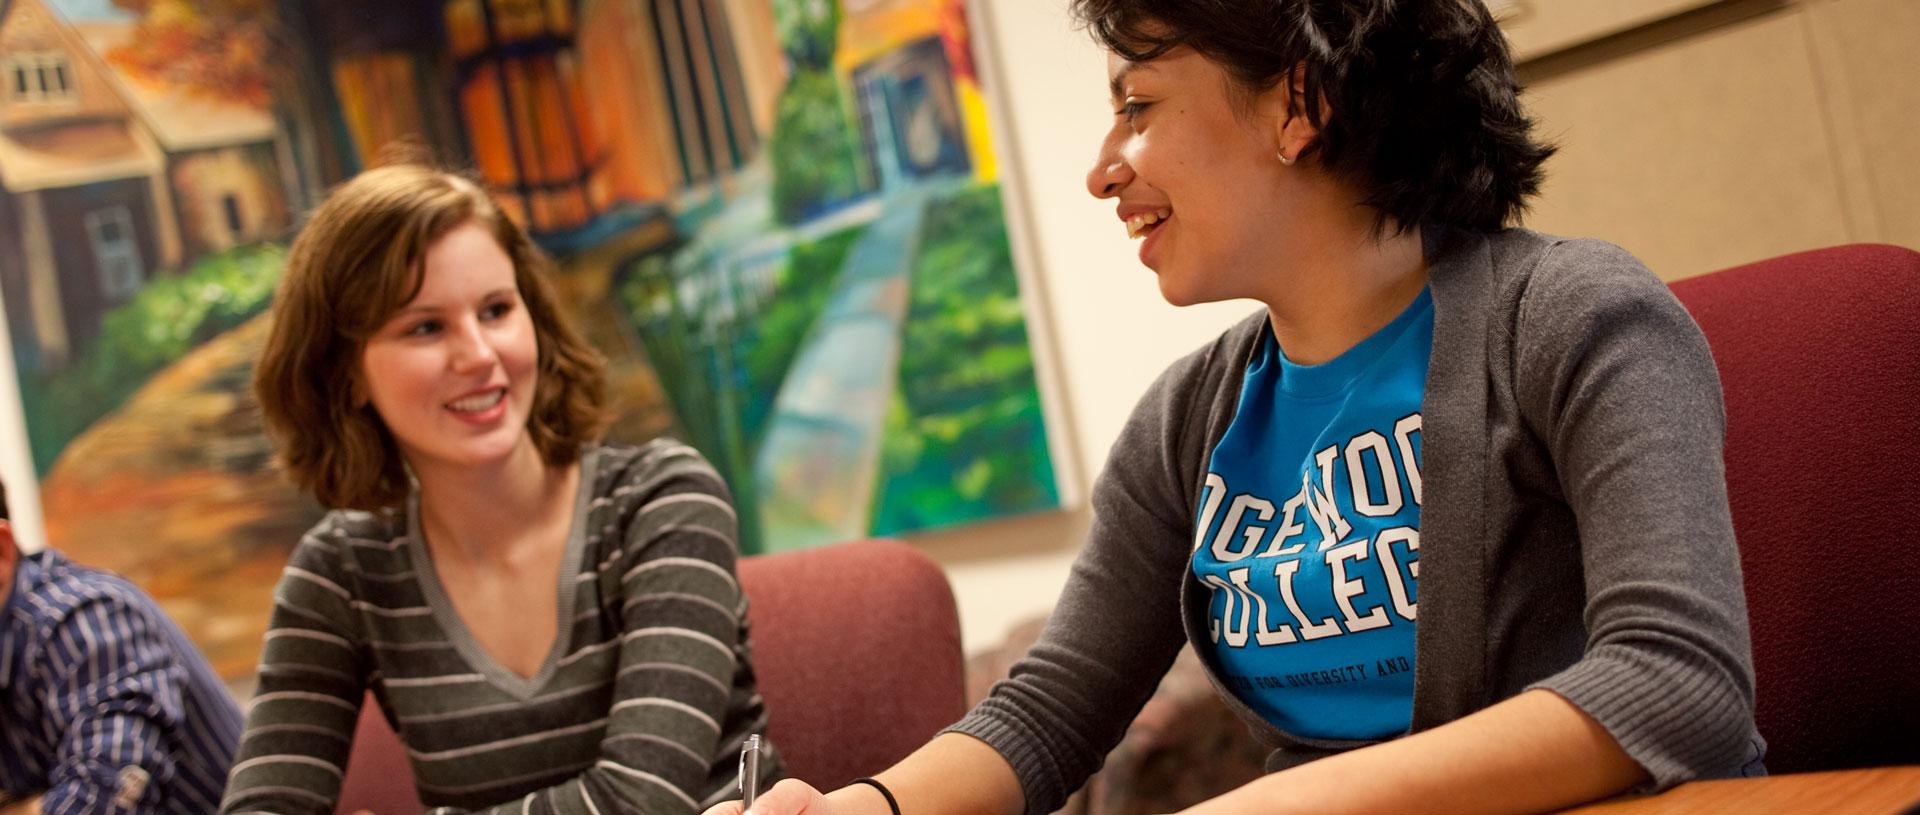 Female undergrad students conversing.